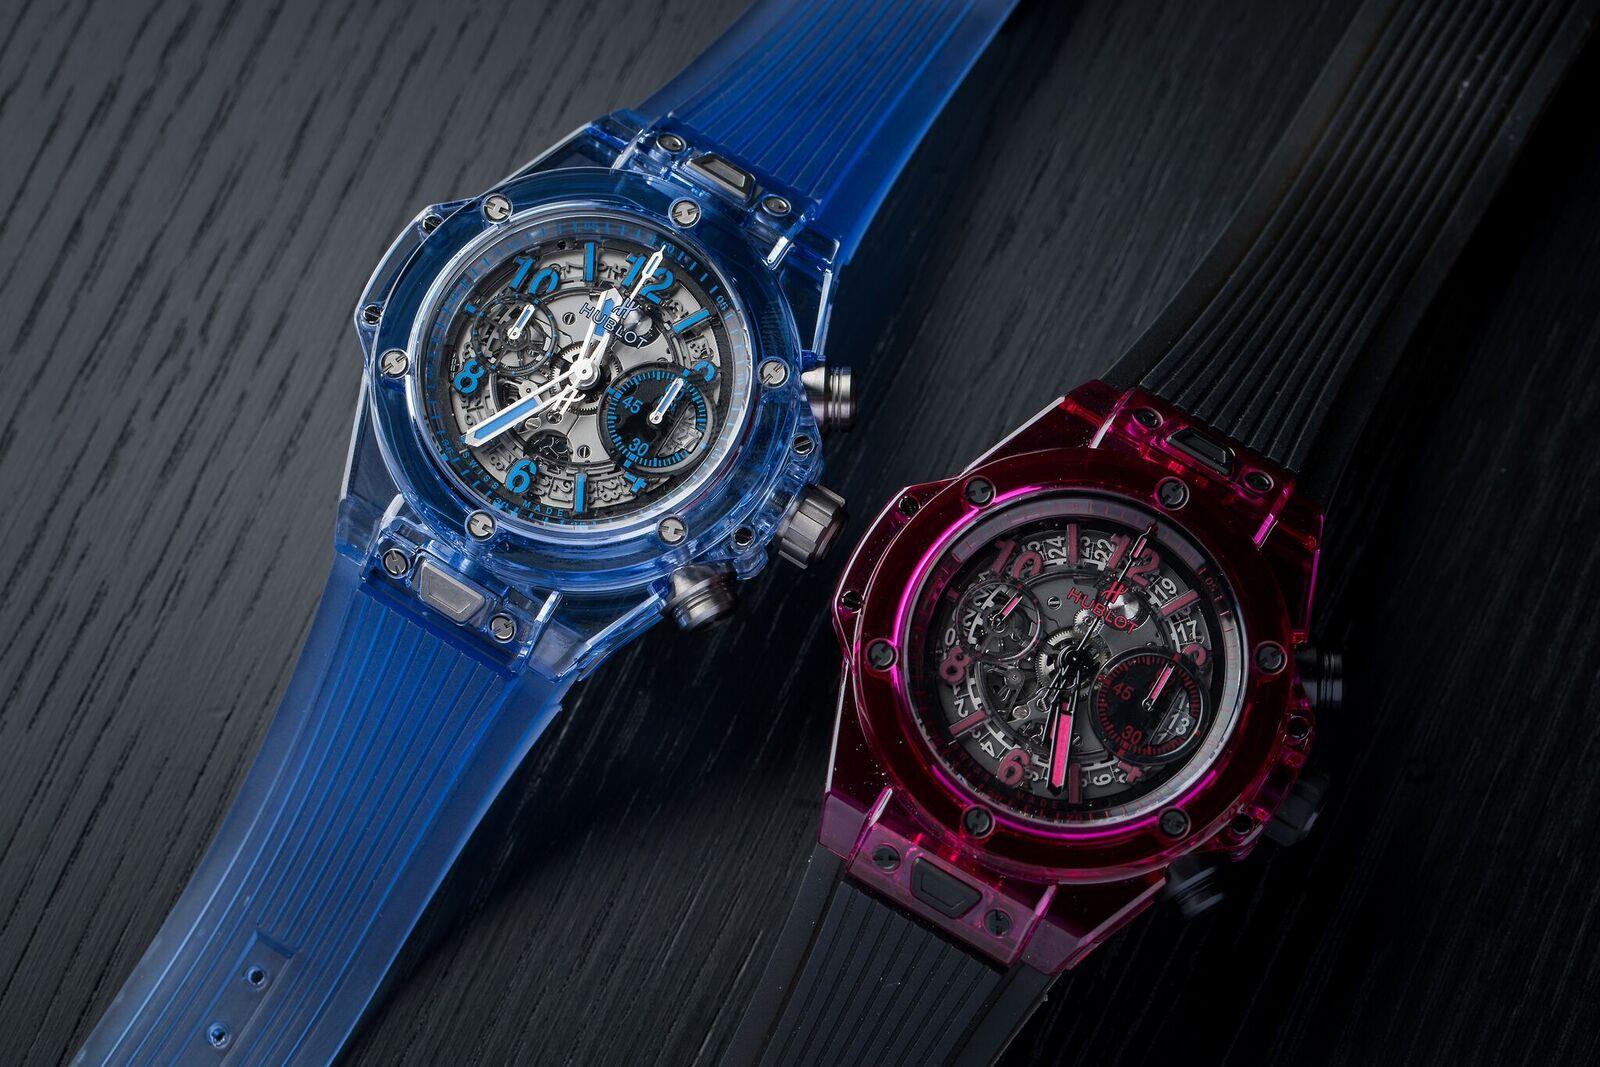 Đồng hồ Hublot Sapphire